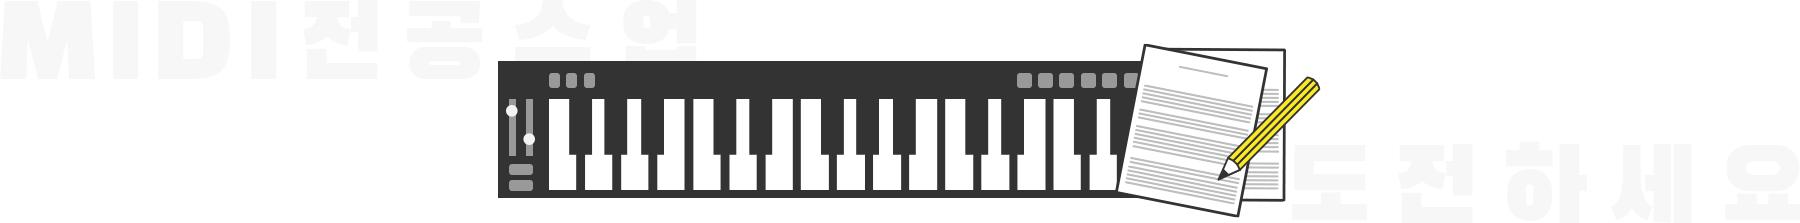 MIDI배경.pc